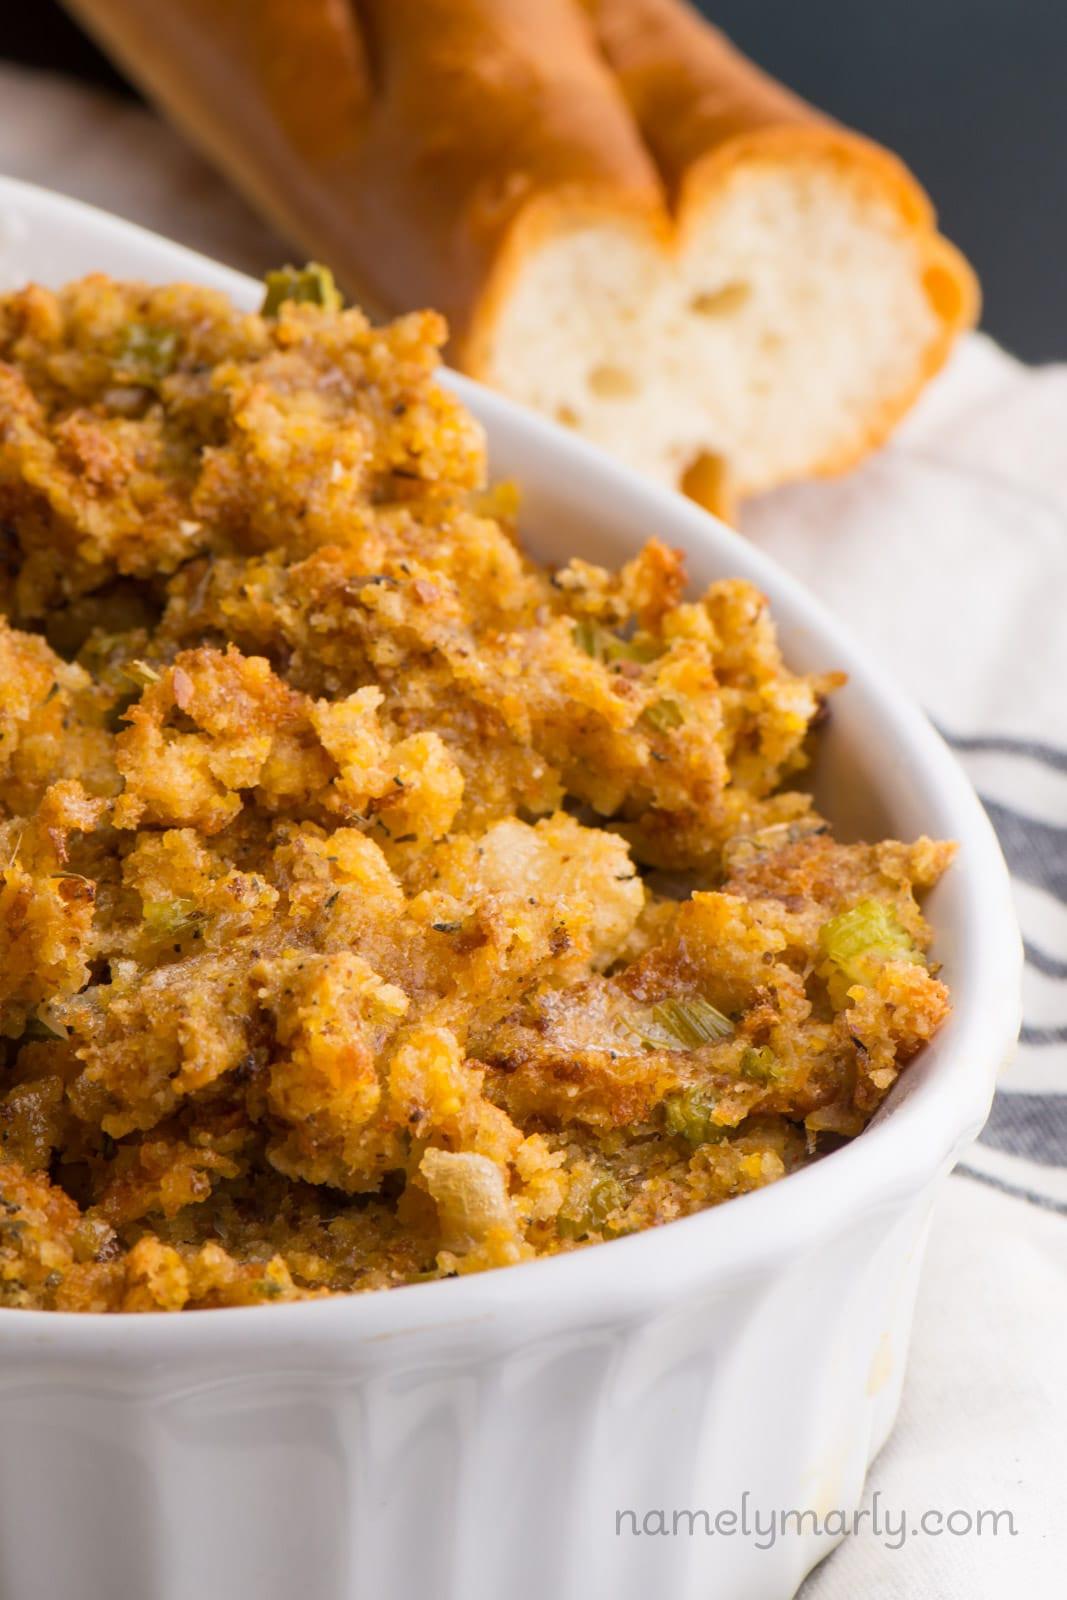 Easy Vegan Thanksgiving Recipes  Best Ever Easy Vegan Stuffing Recipe Namely Marly